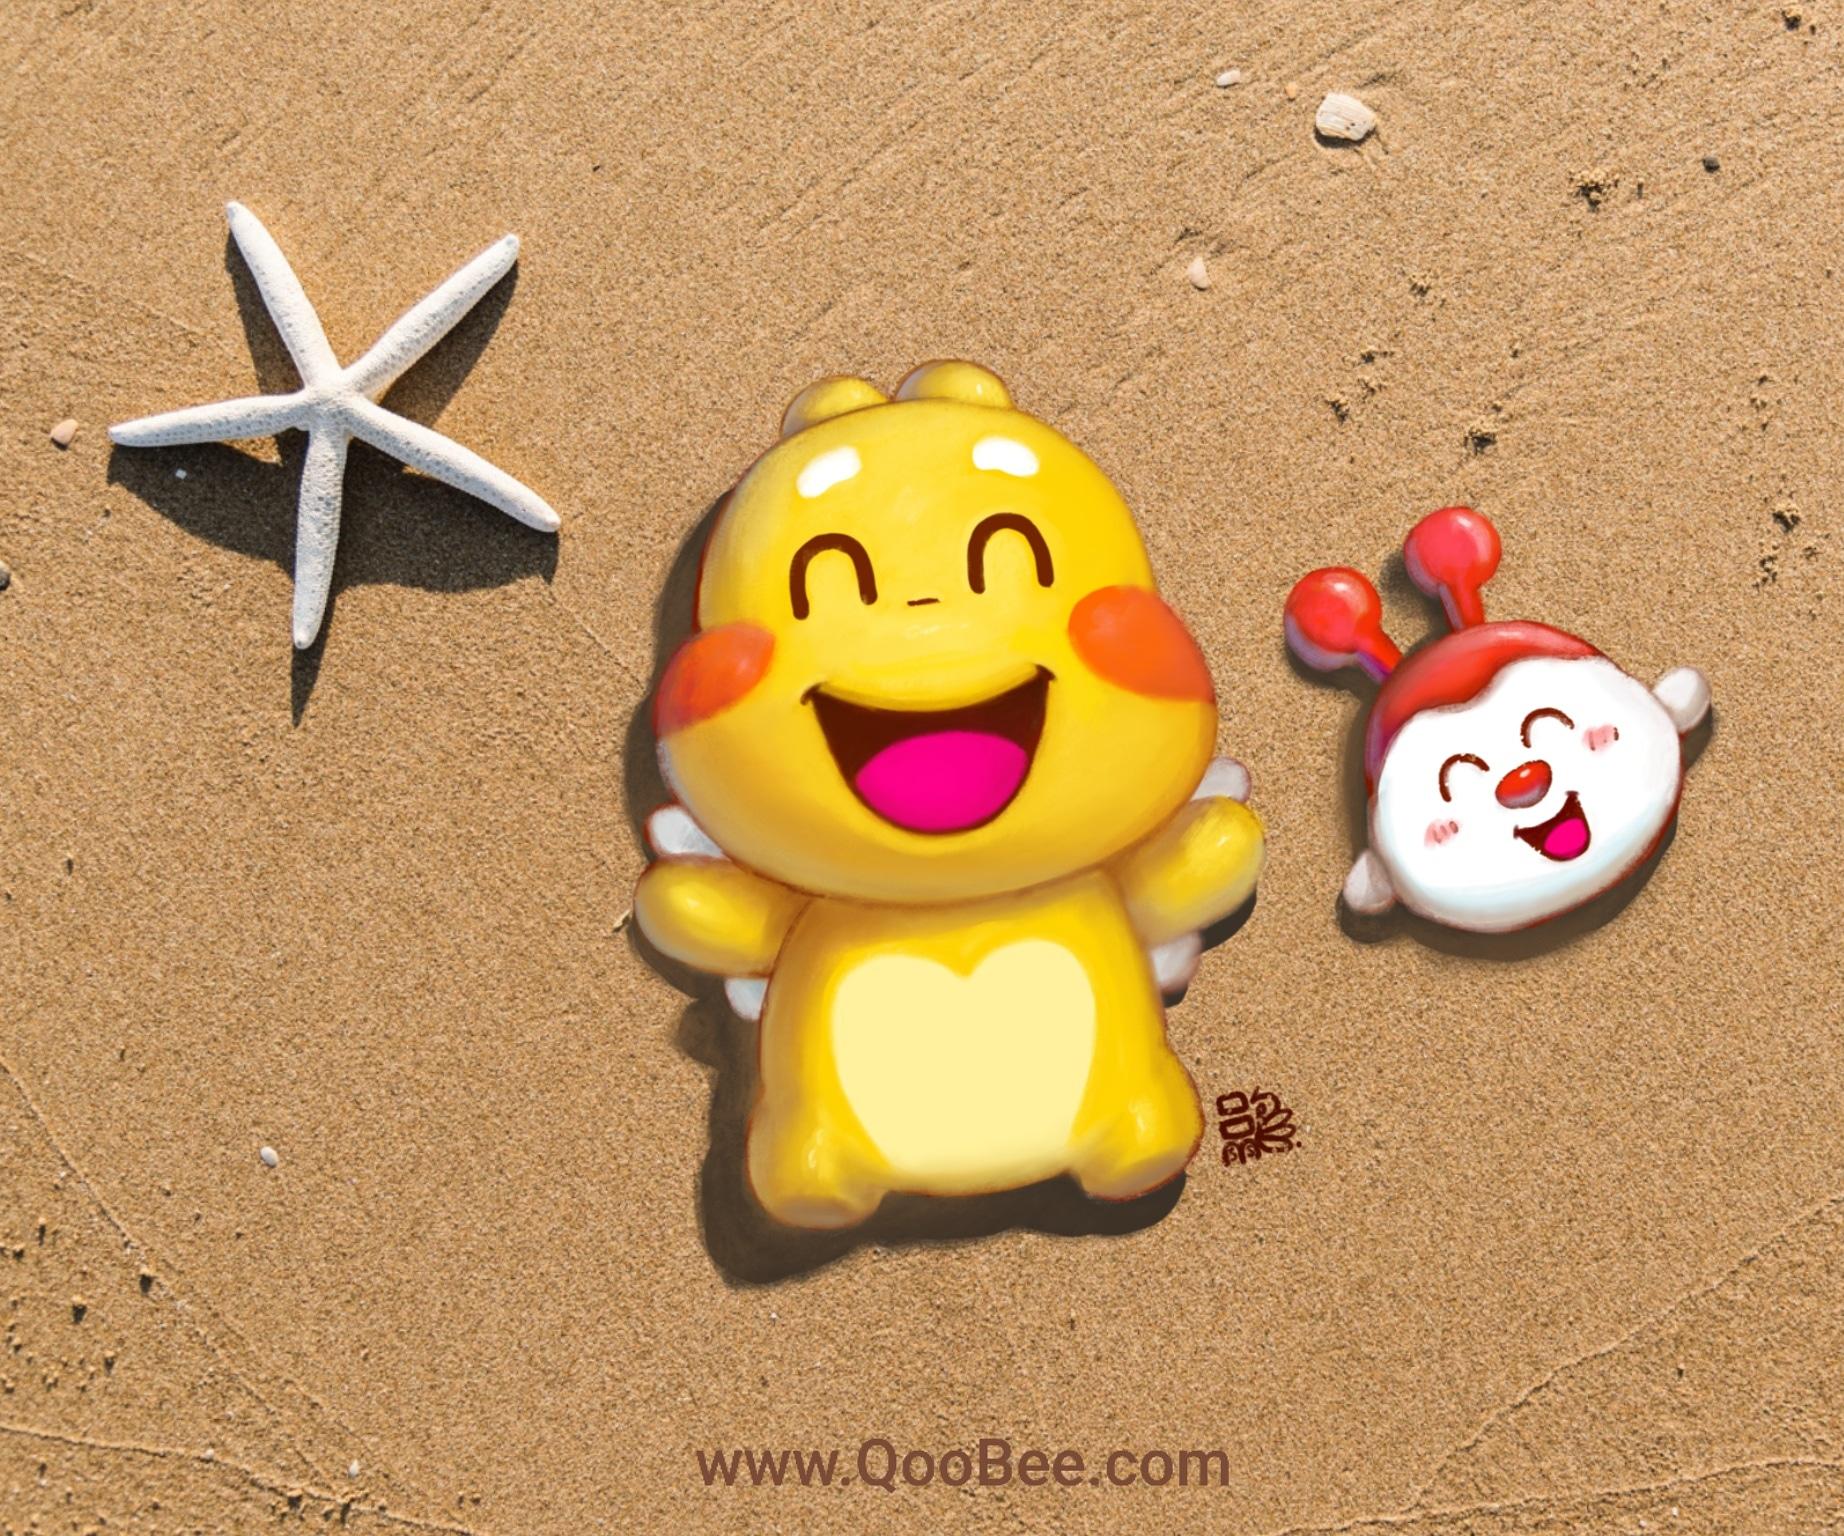 Qoobee和奶豆在沙滩上玩耍